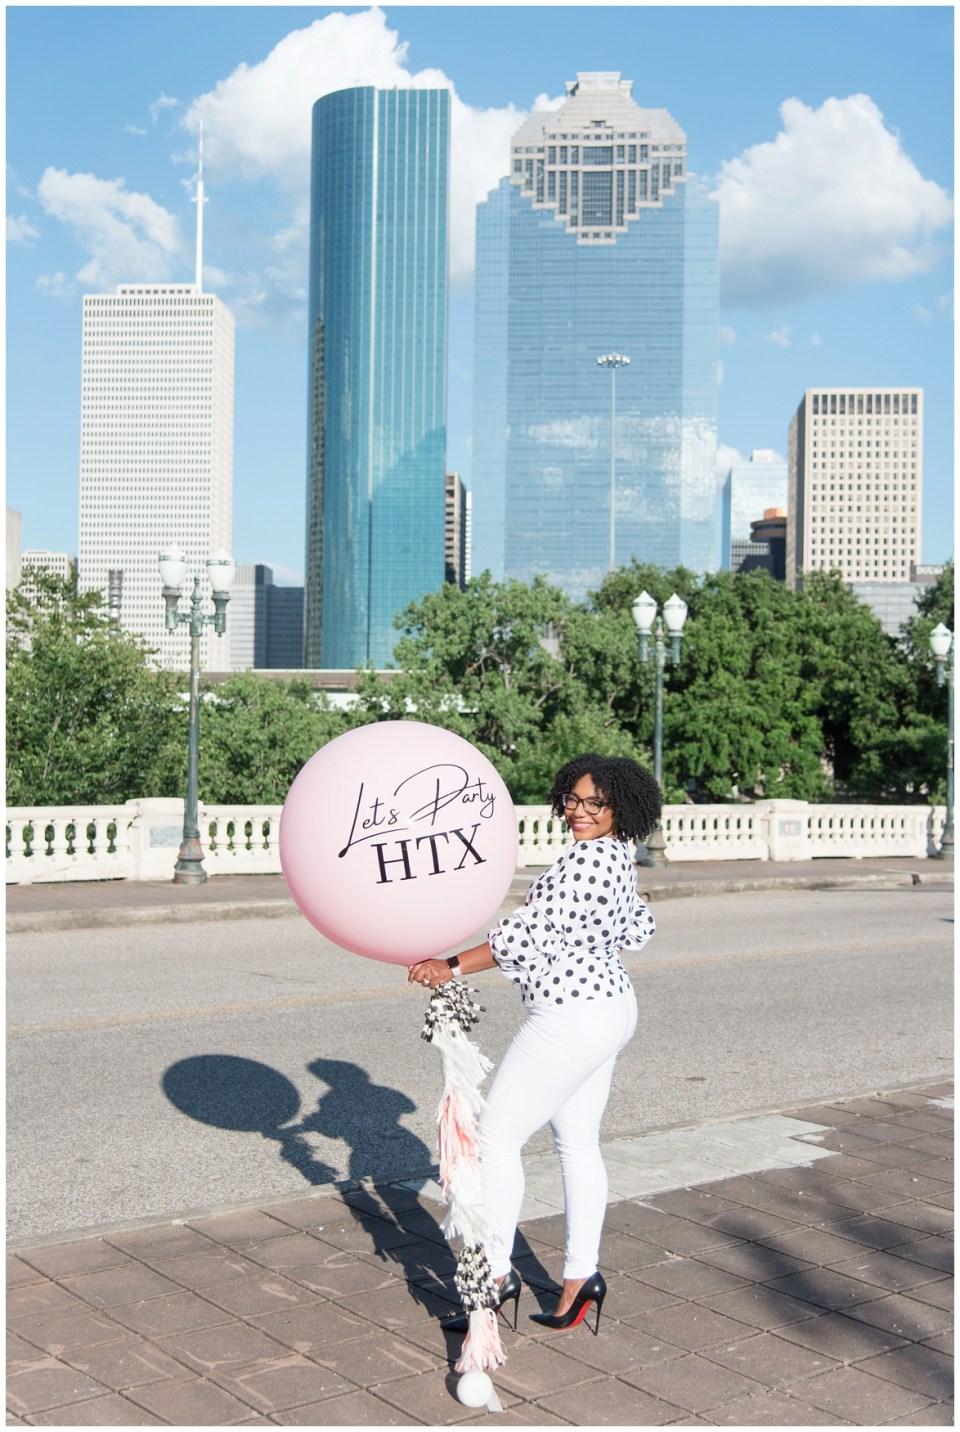 Houston brand photographer - session on Houston's Sabine Street Bridge for Let's Party HTX